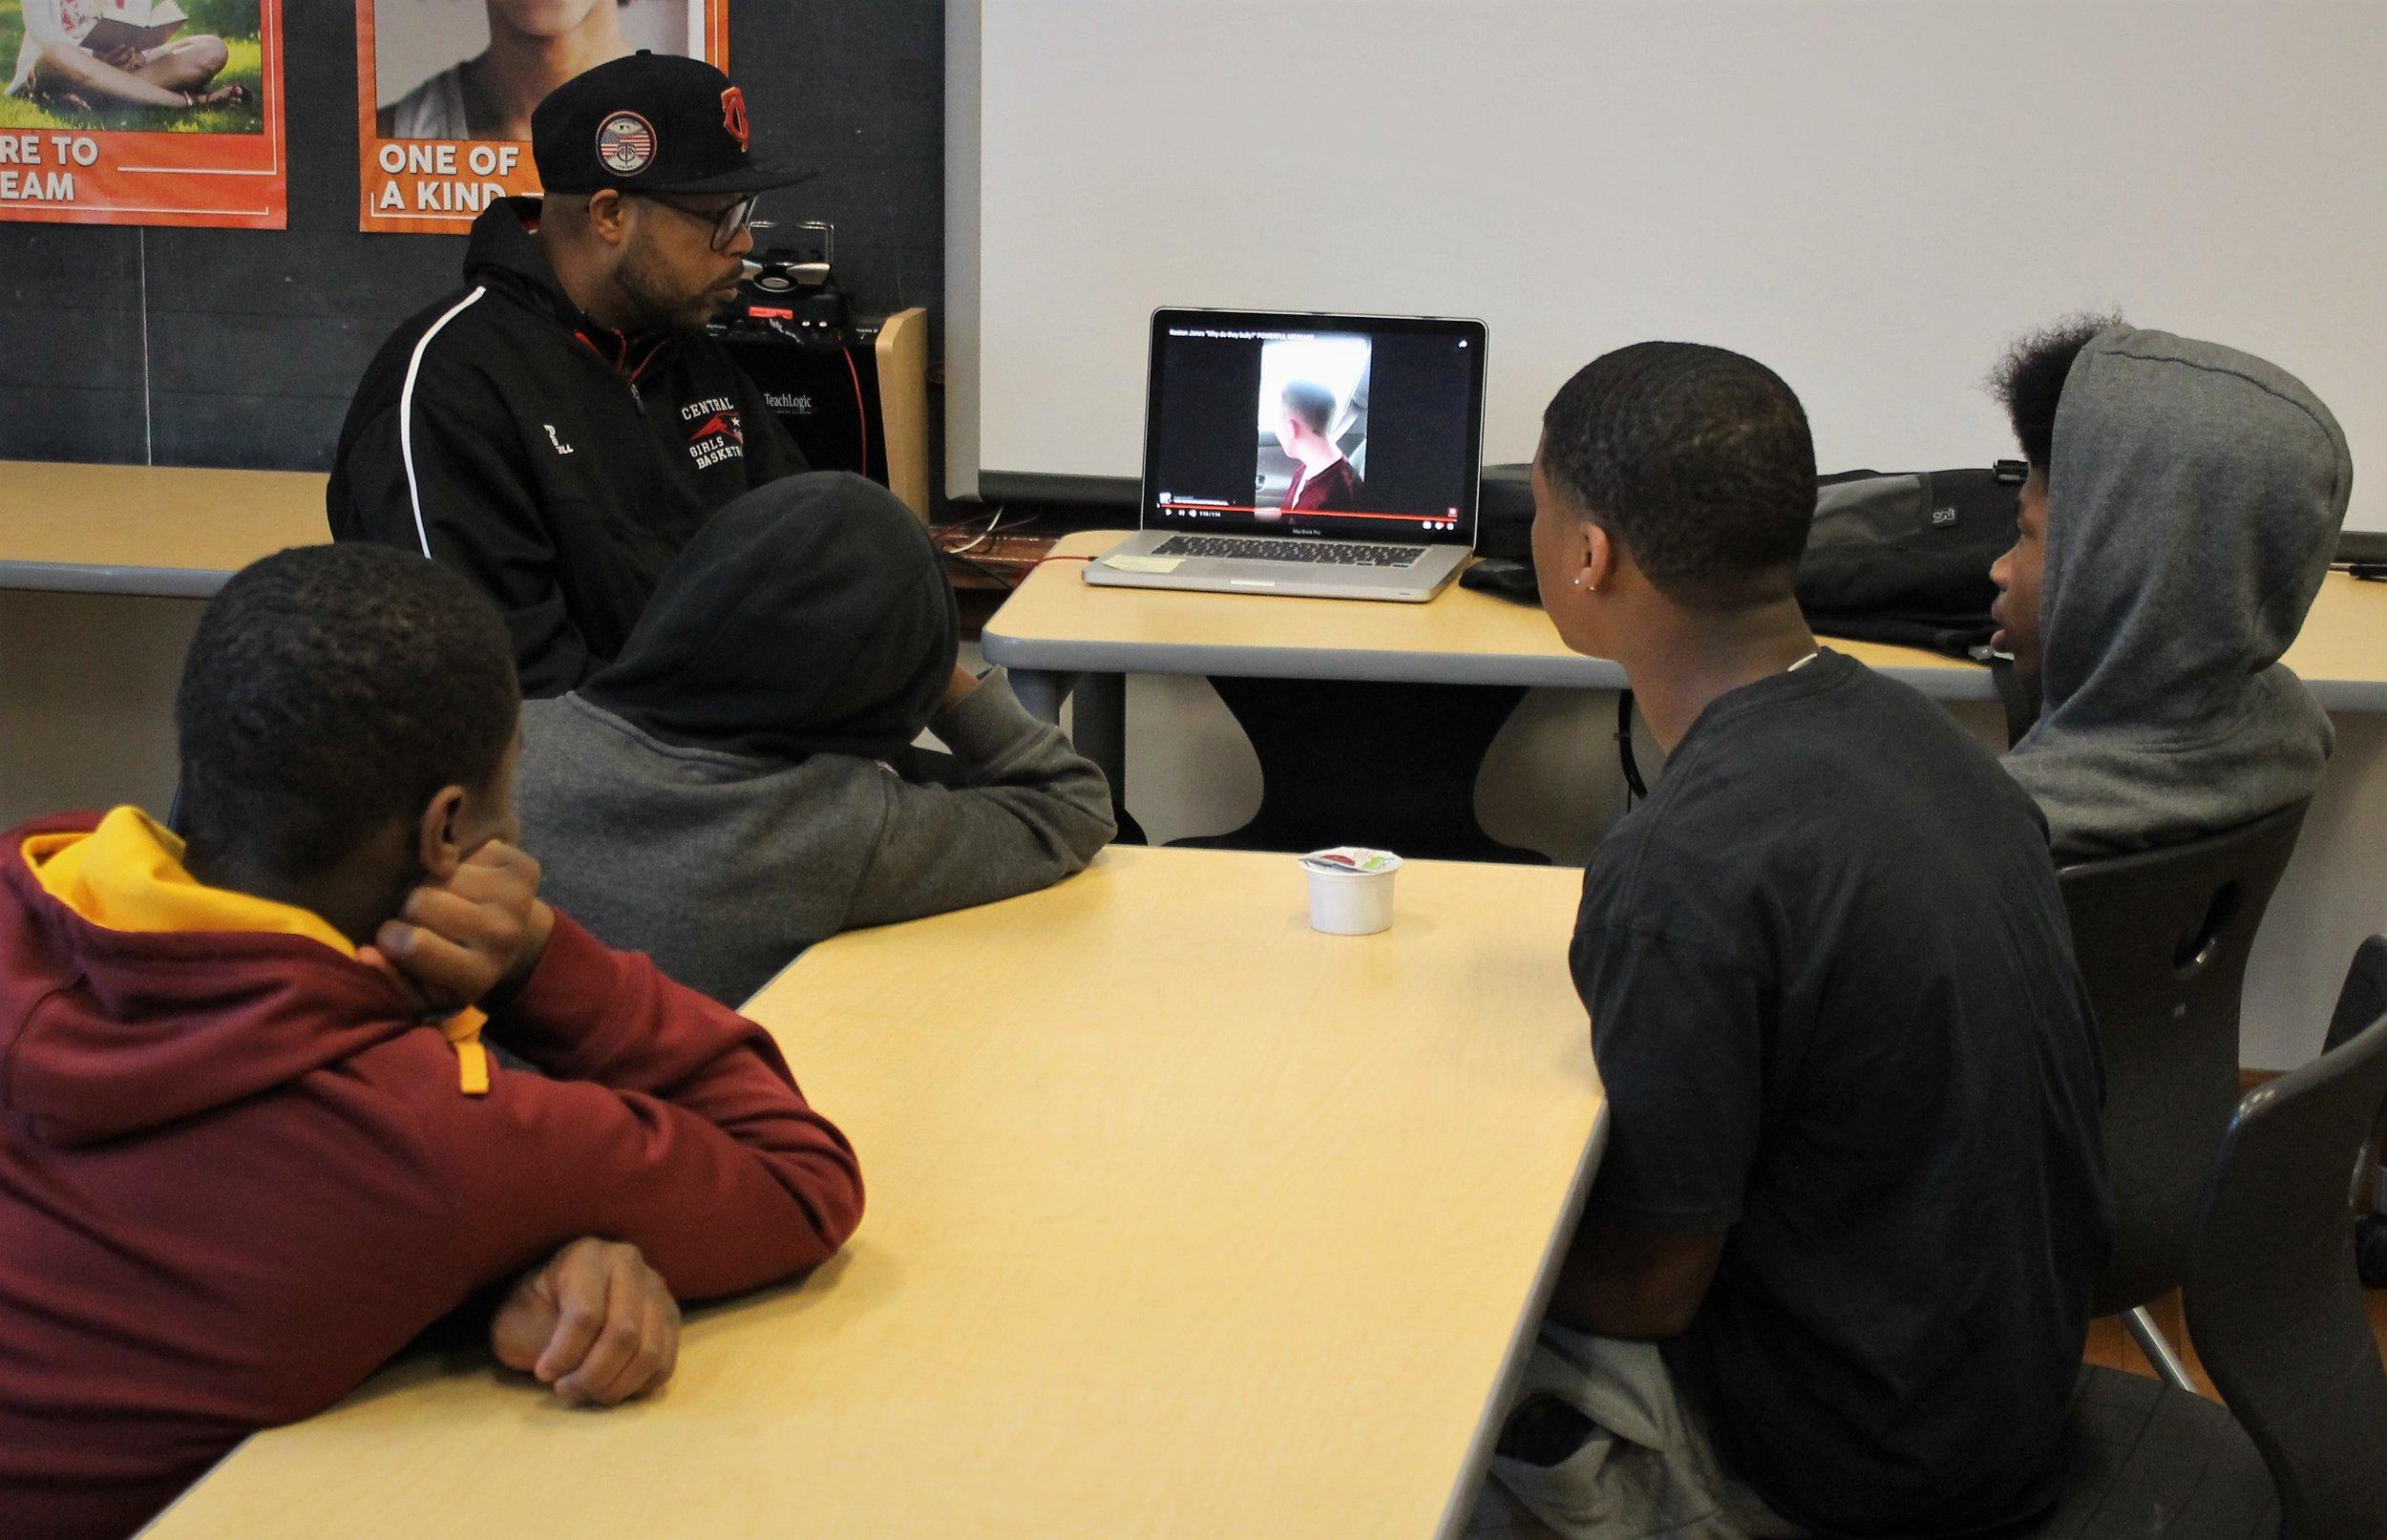 New Lens Urban Mentoring Society Ramsey Middle School #NewLensSociety 01.JPG